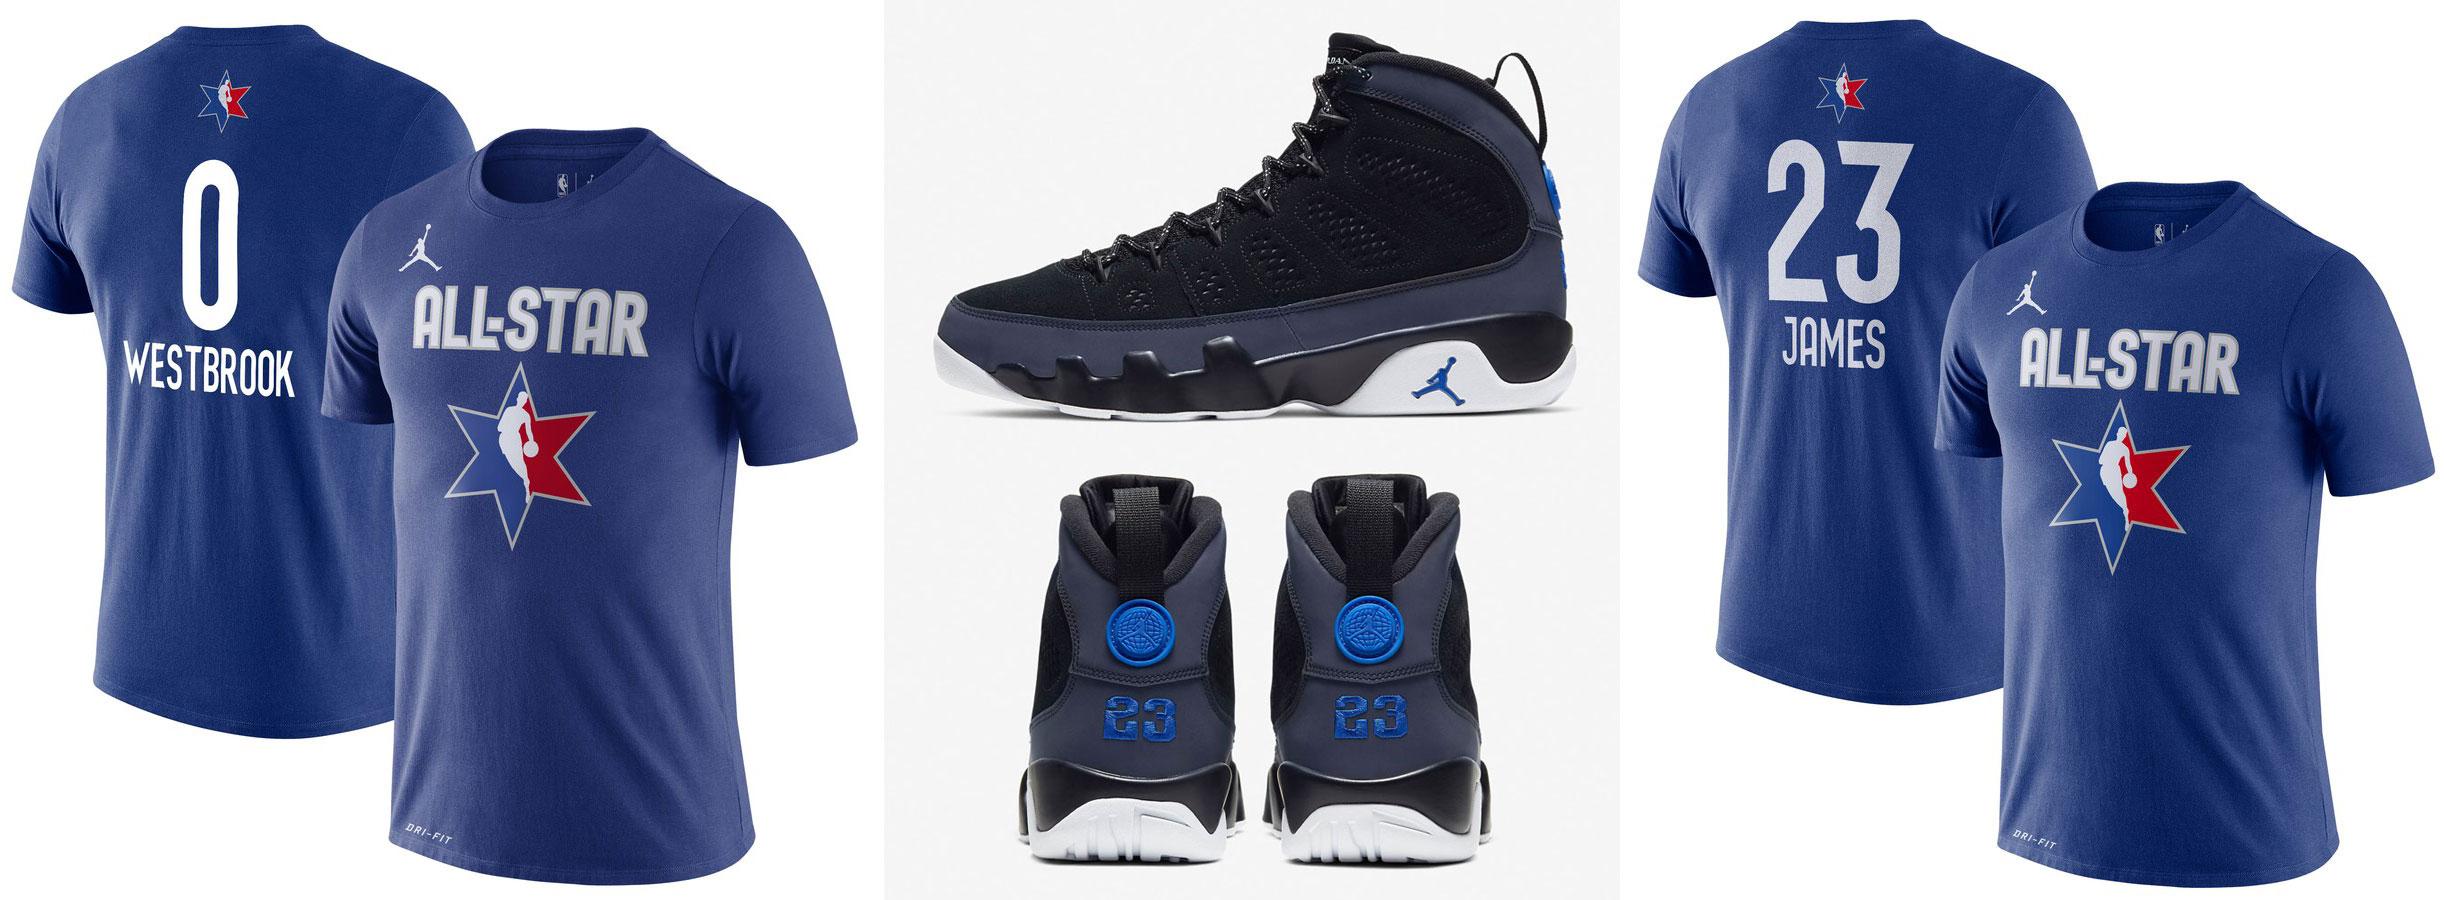 air-jordan-9-racer-blue-nba-all-star-shirts